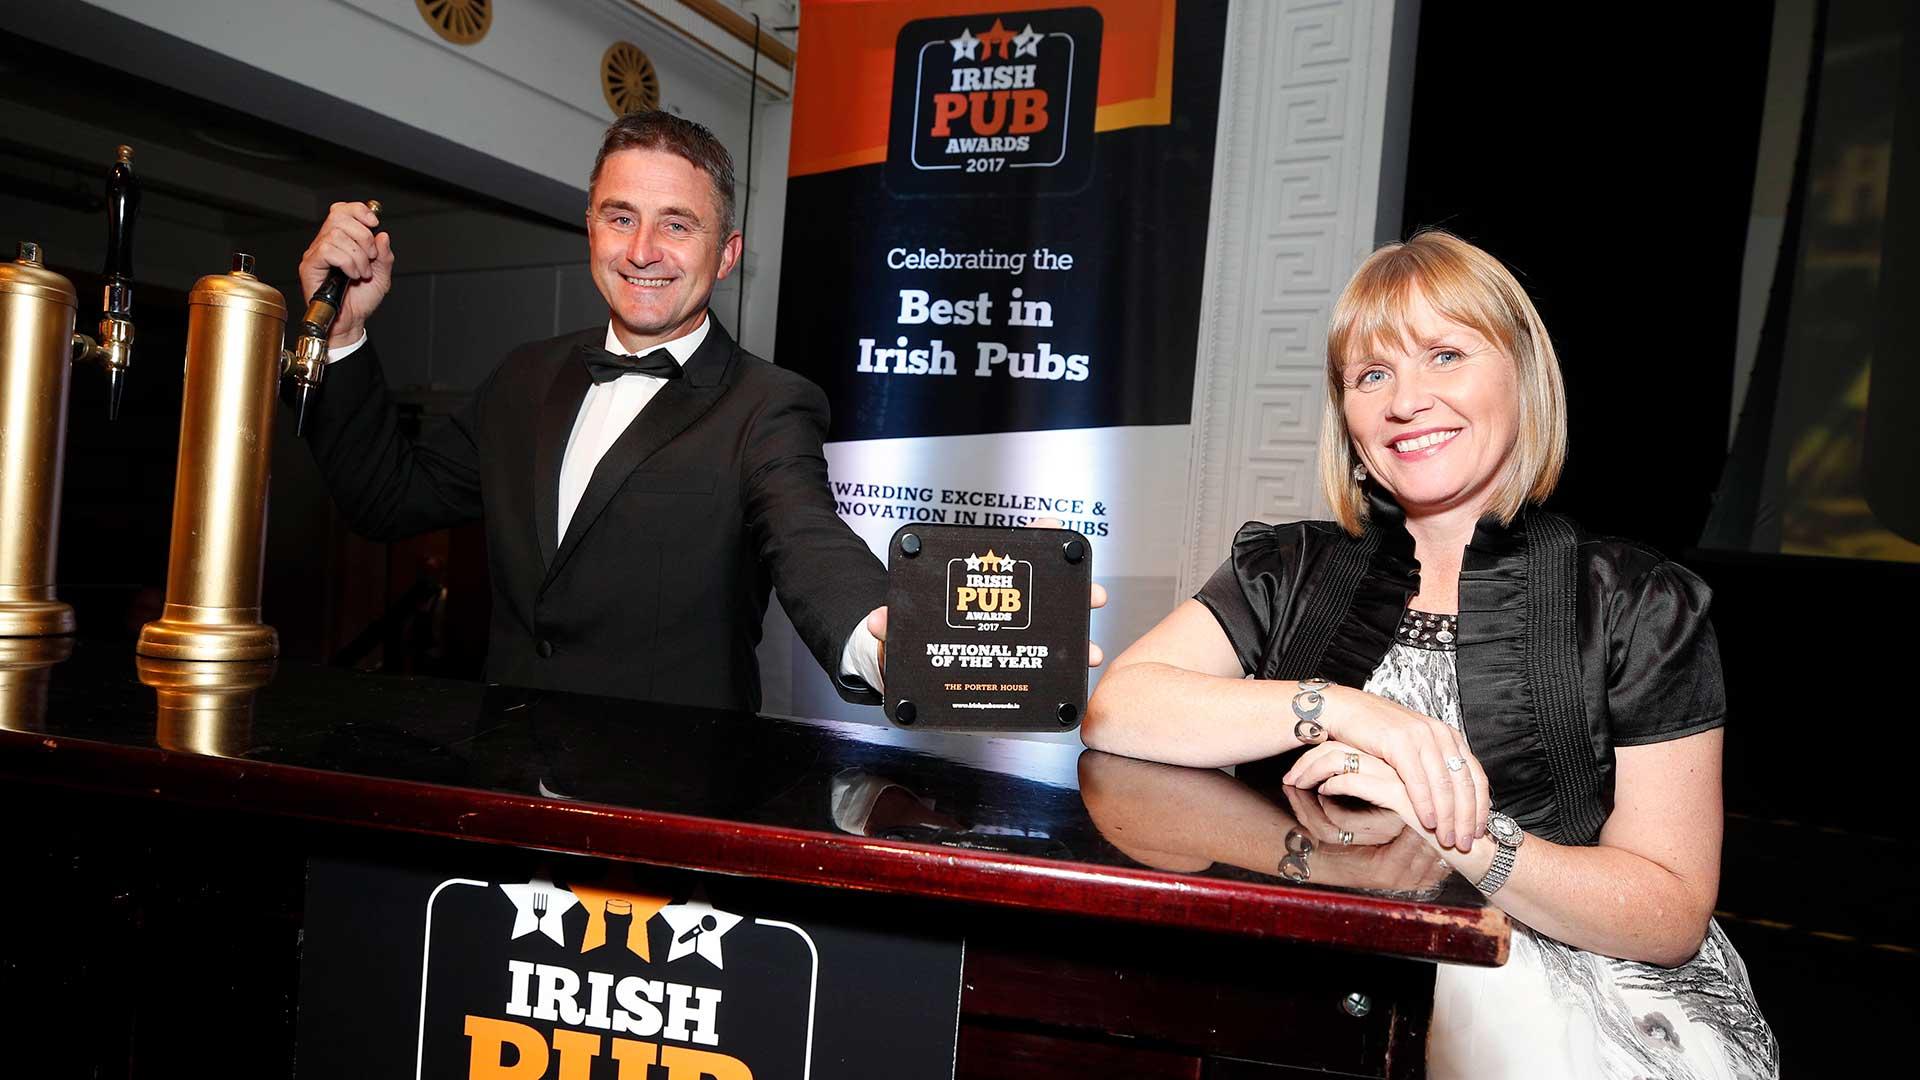 The Porter House Wexford is the Irish Pub Awards 2017 winner